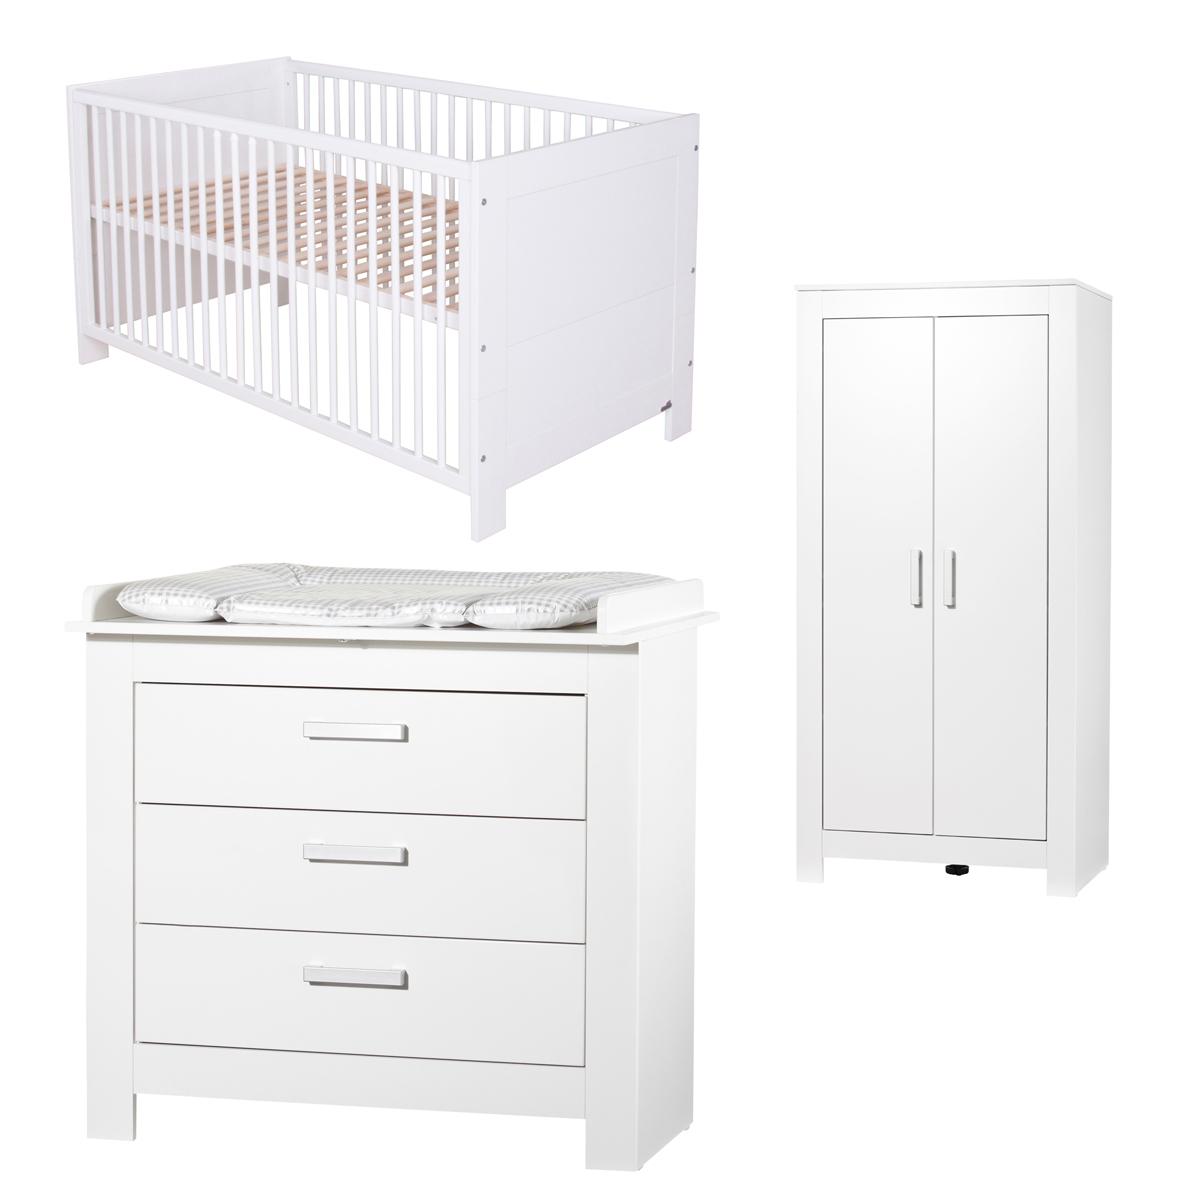 armoire 2 portes fabulous bopita armoire portes corsica. Black Bedroom Furniture Sets. Home Design Ideas